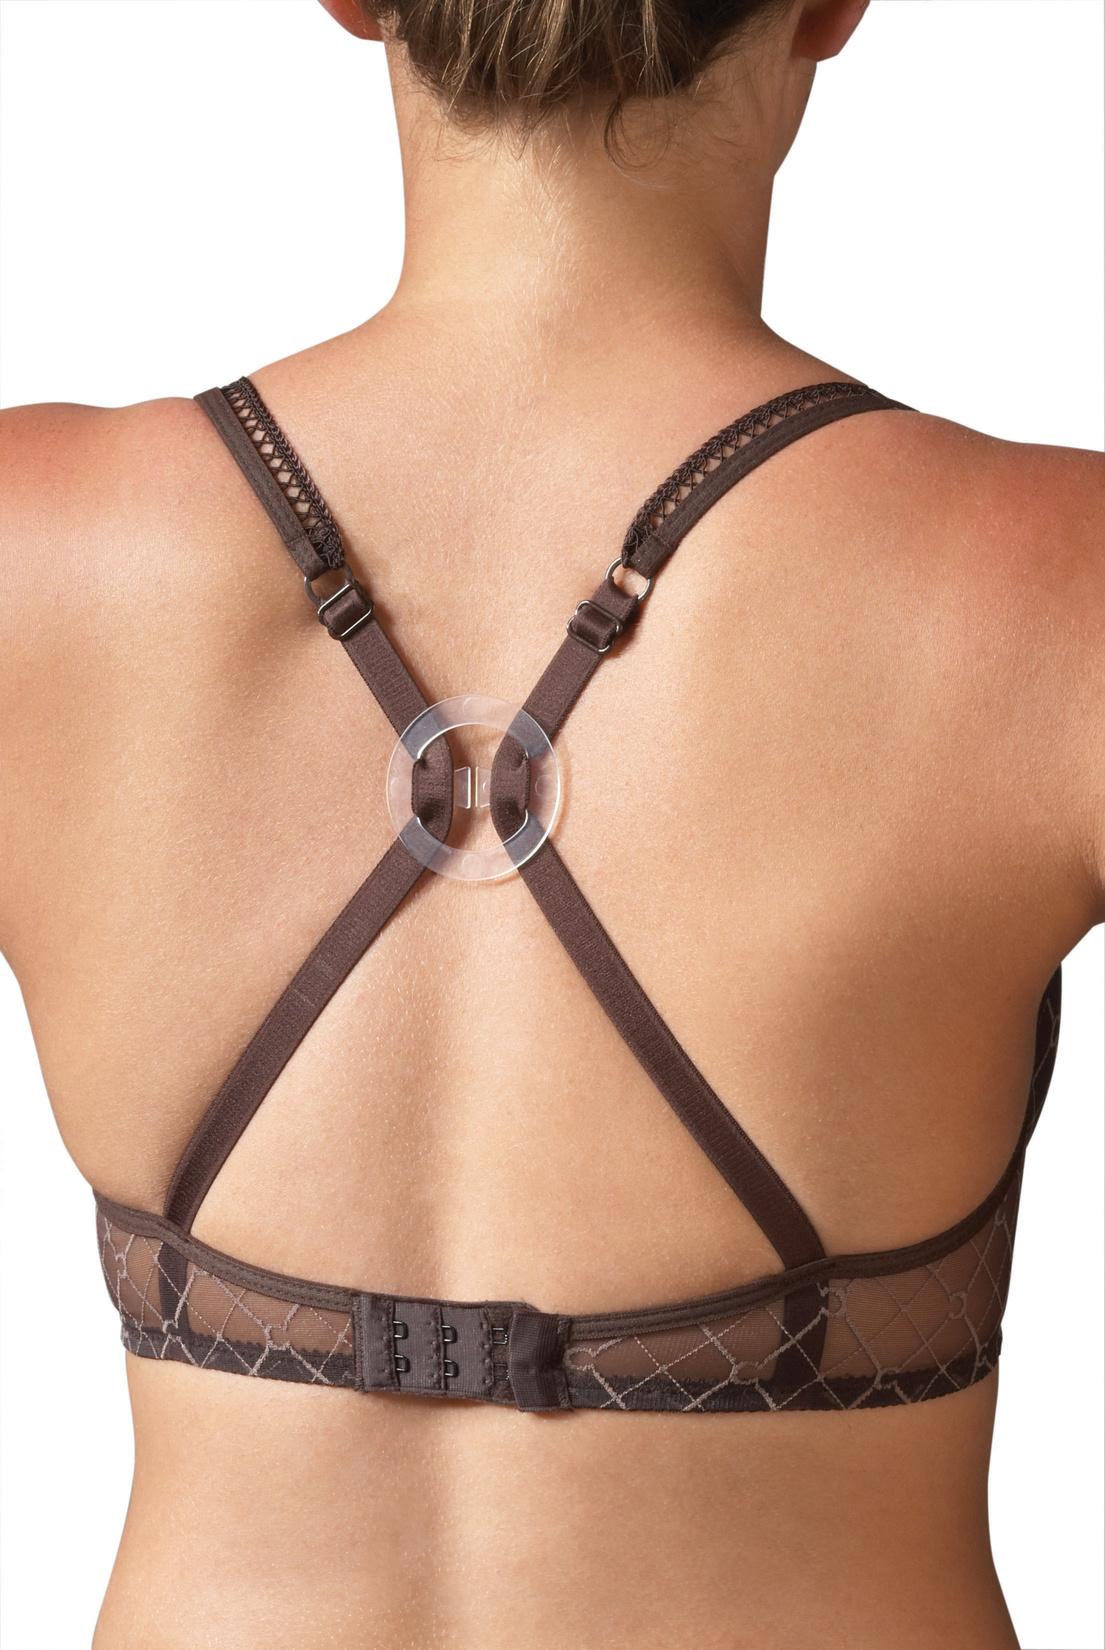 hollywood hook up bra converter